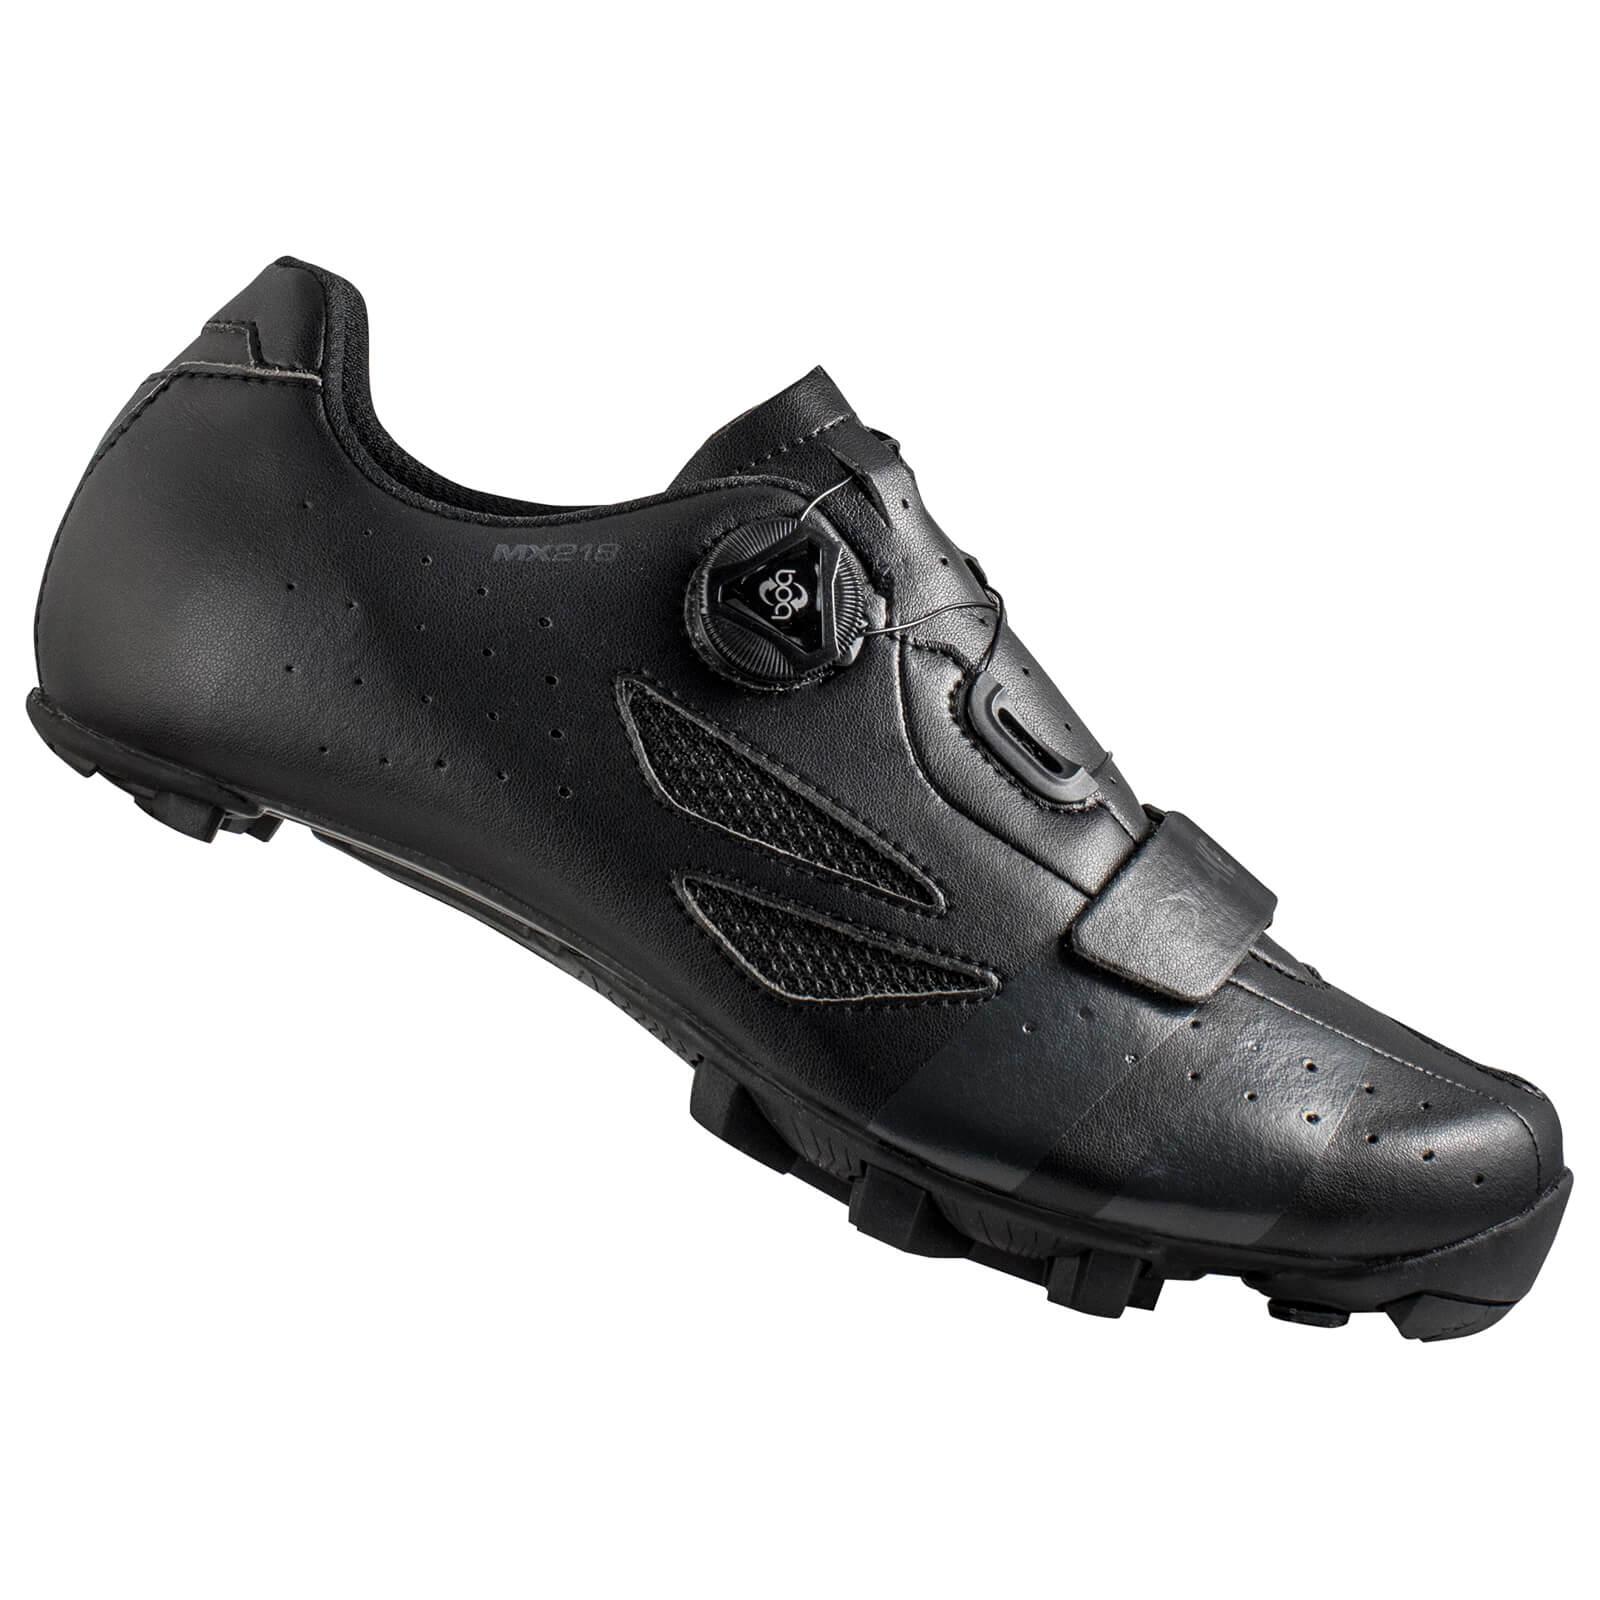 Lake MX218 Carbon MTB Shoes - Black/Grey - EU 40